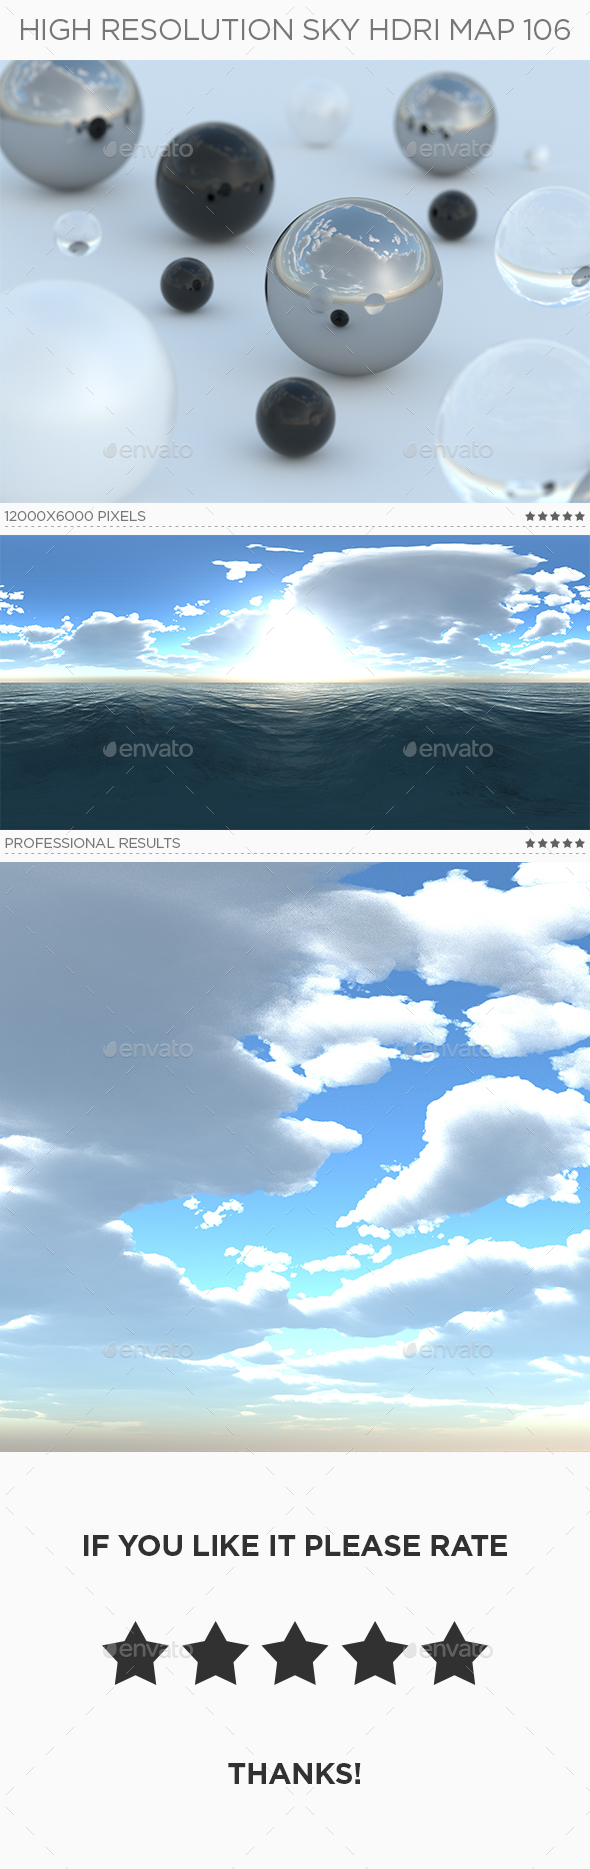 High Resolution Sky HDRi Map 106 - 3DOcean Item for Sale